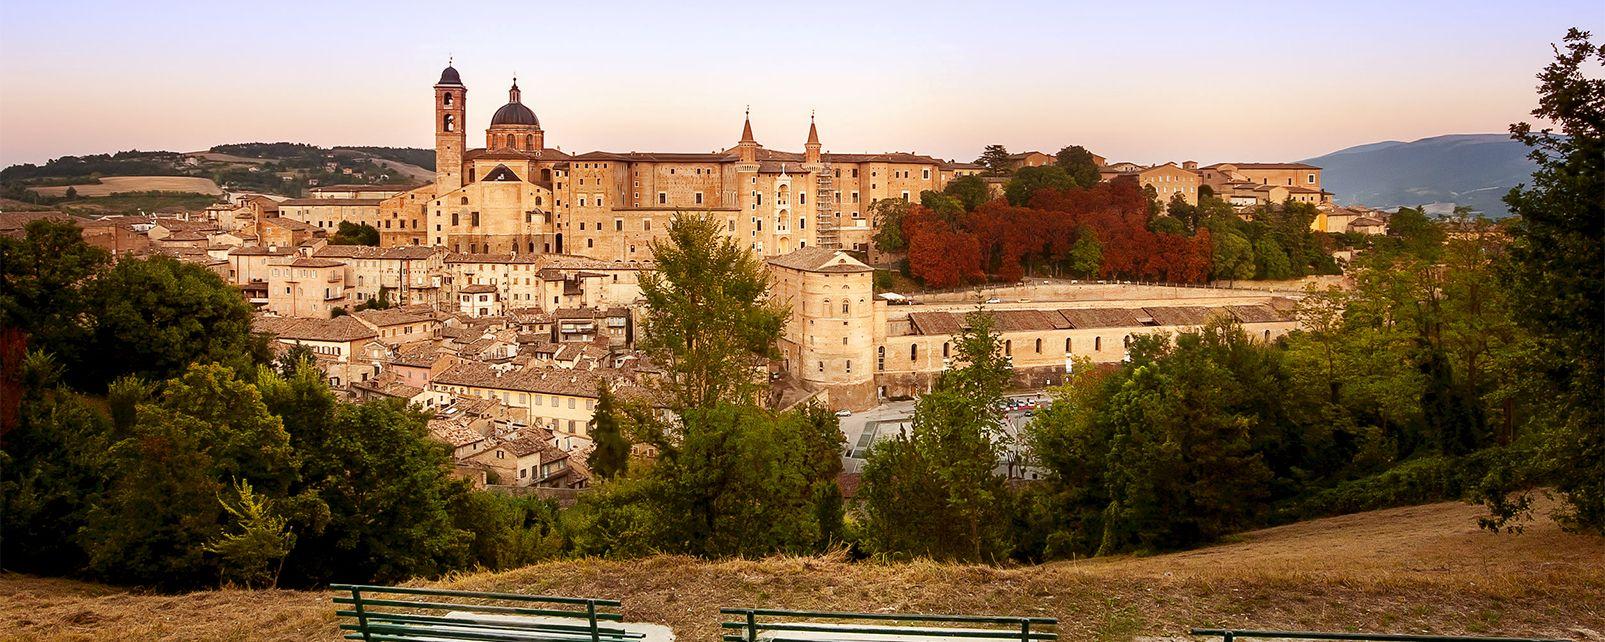 Europe, Italie, Marches, Urbino, centre historique d'Urbino, palais, ville,